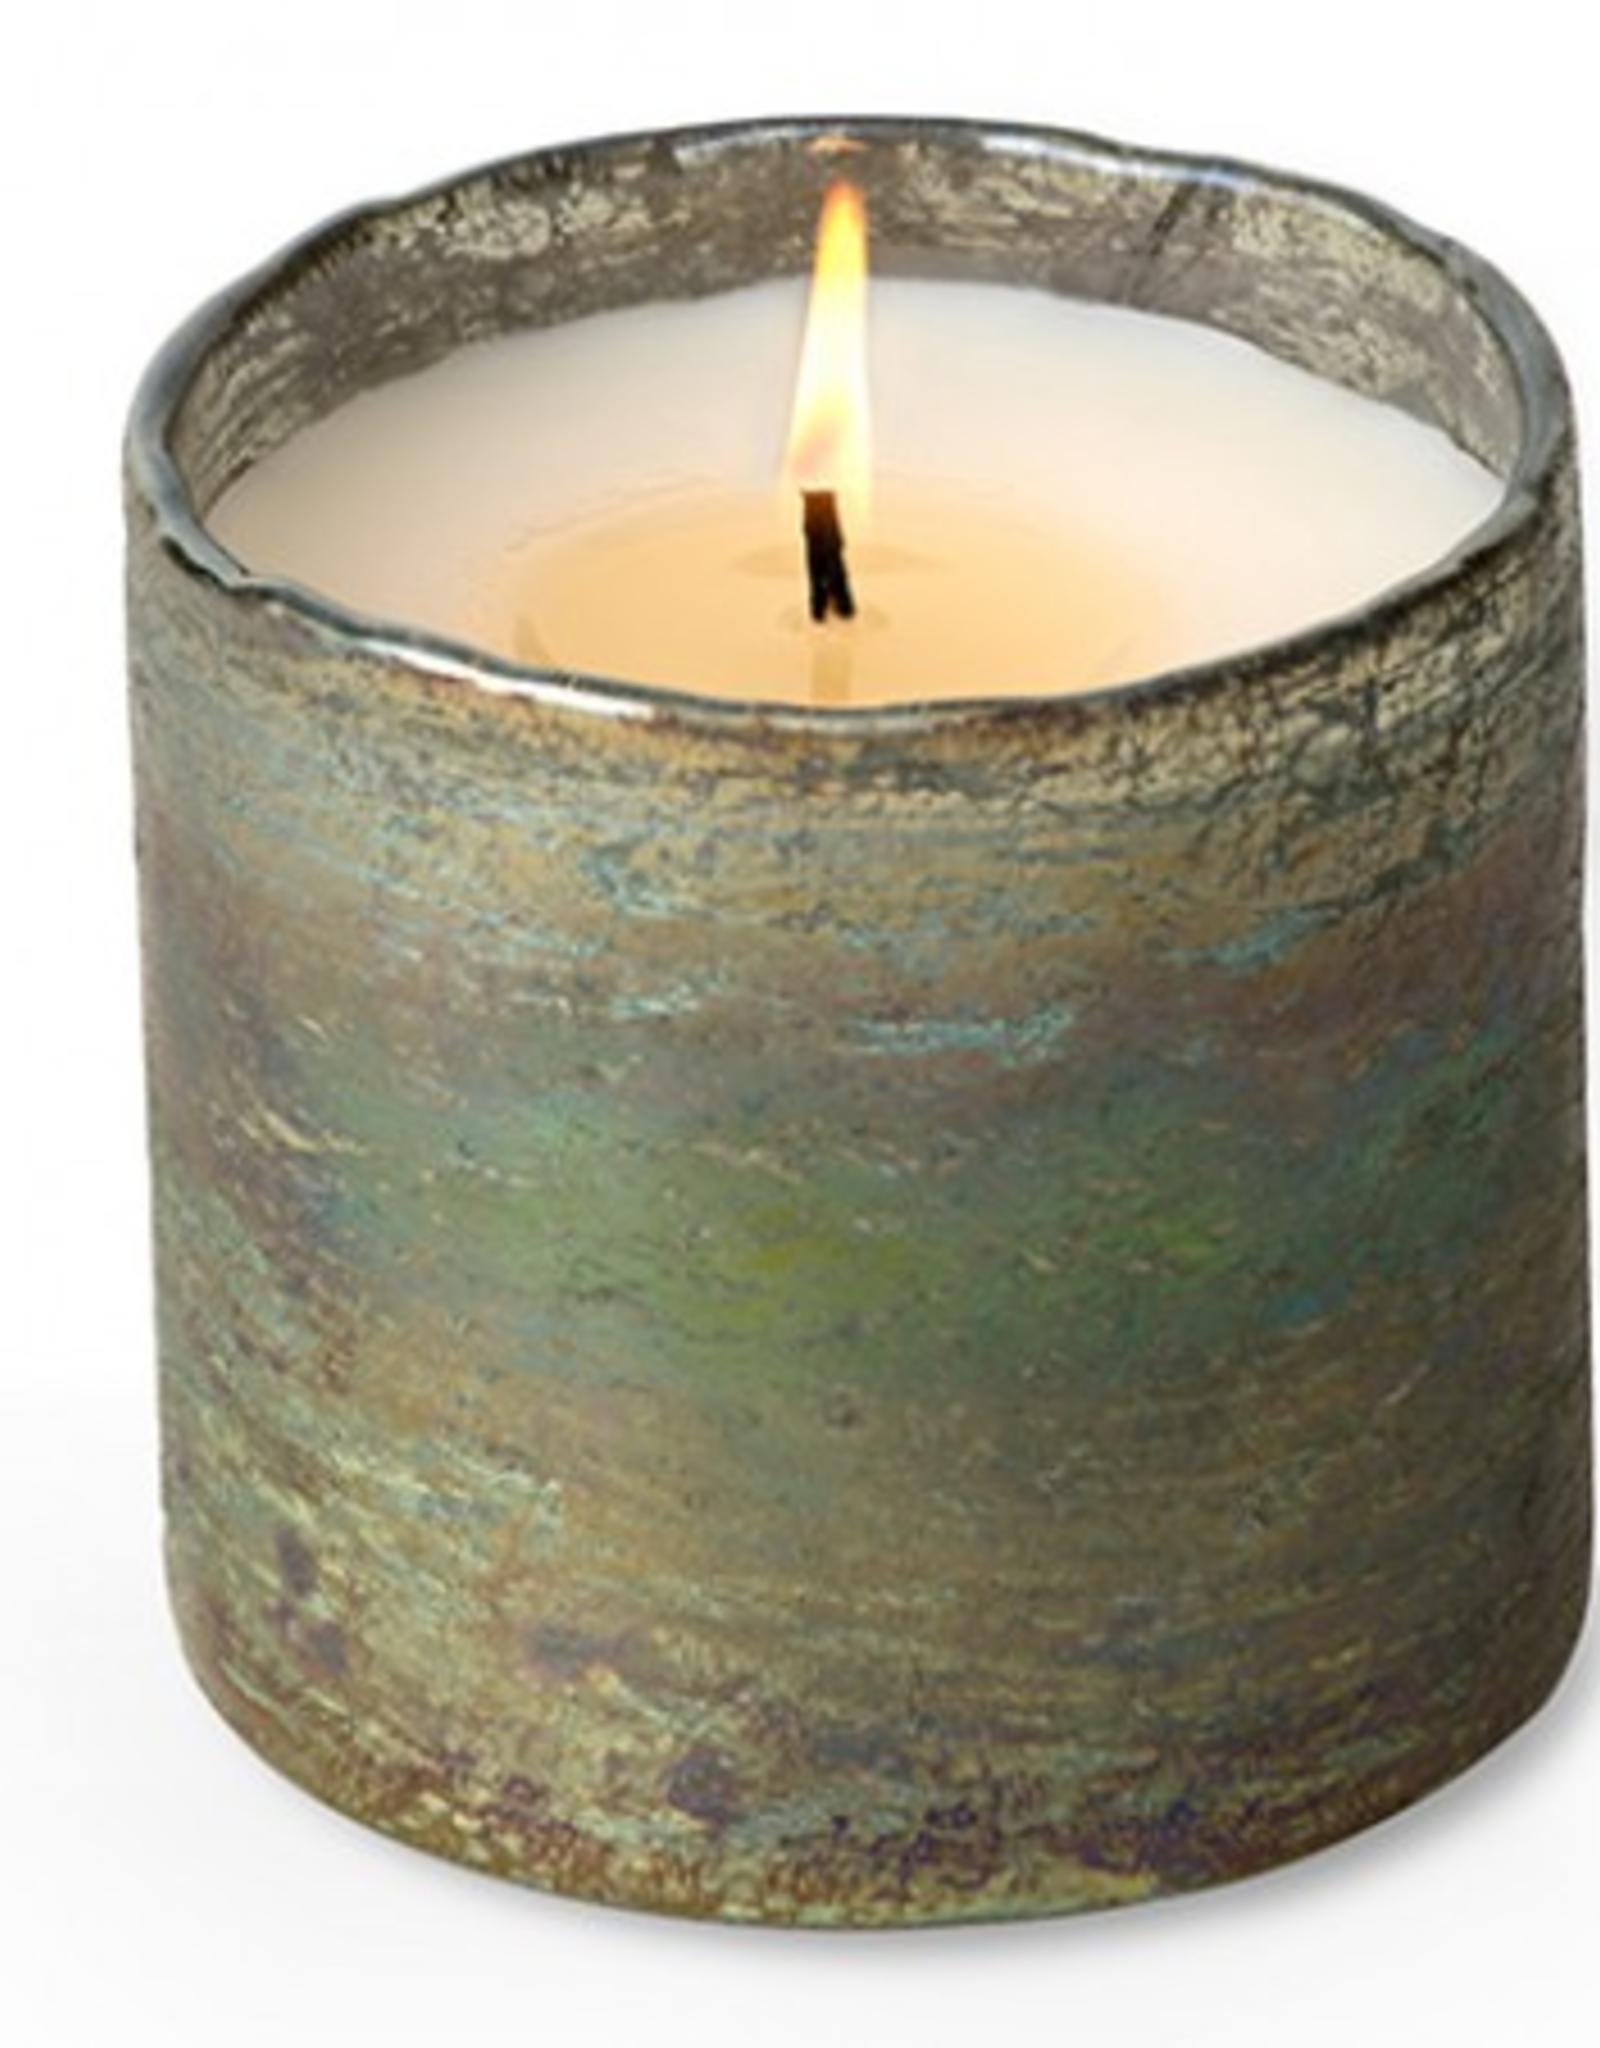 Himalayan Trading Post Artisan Blown Glass Soy Candles